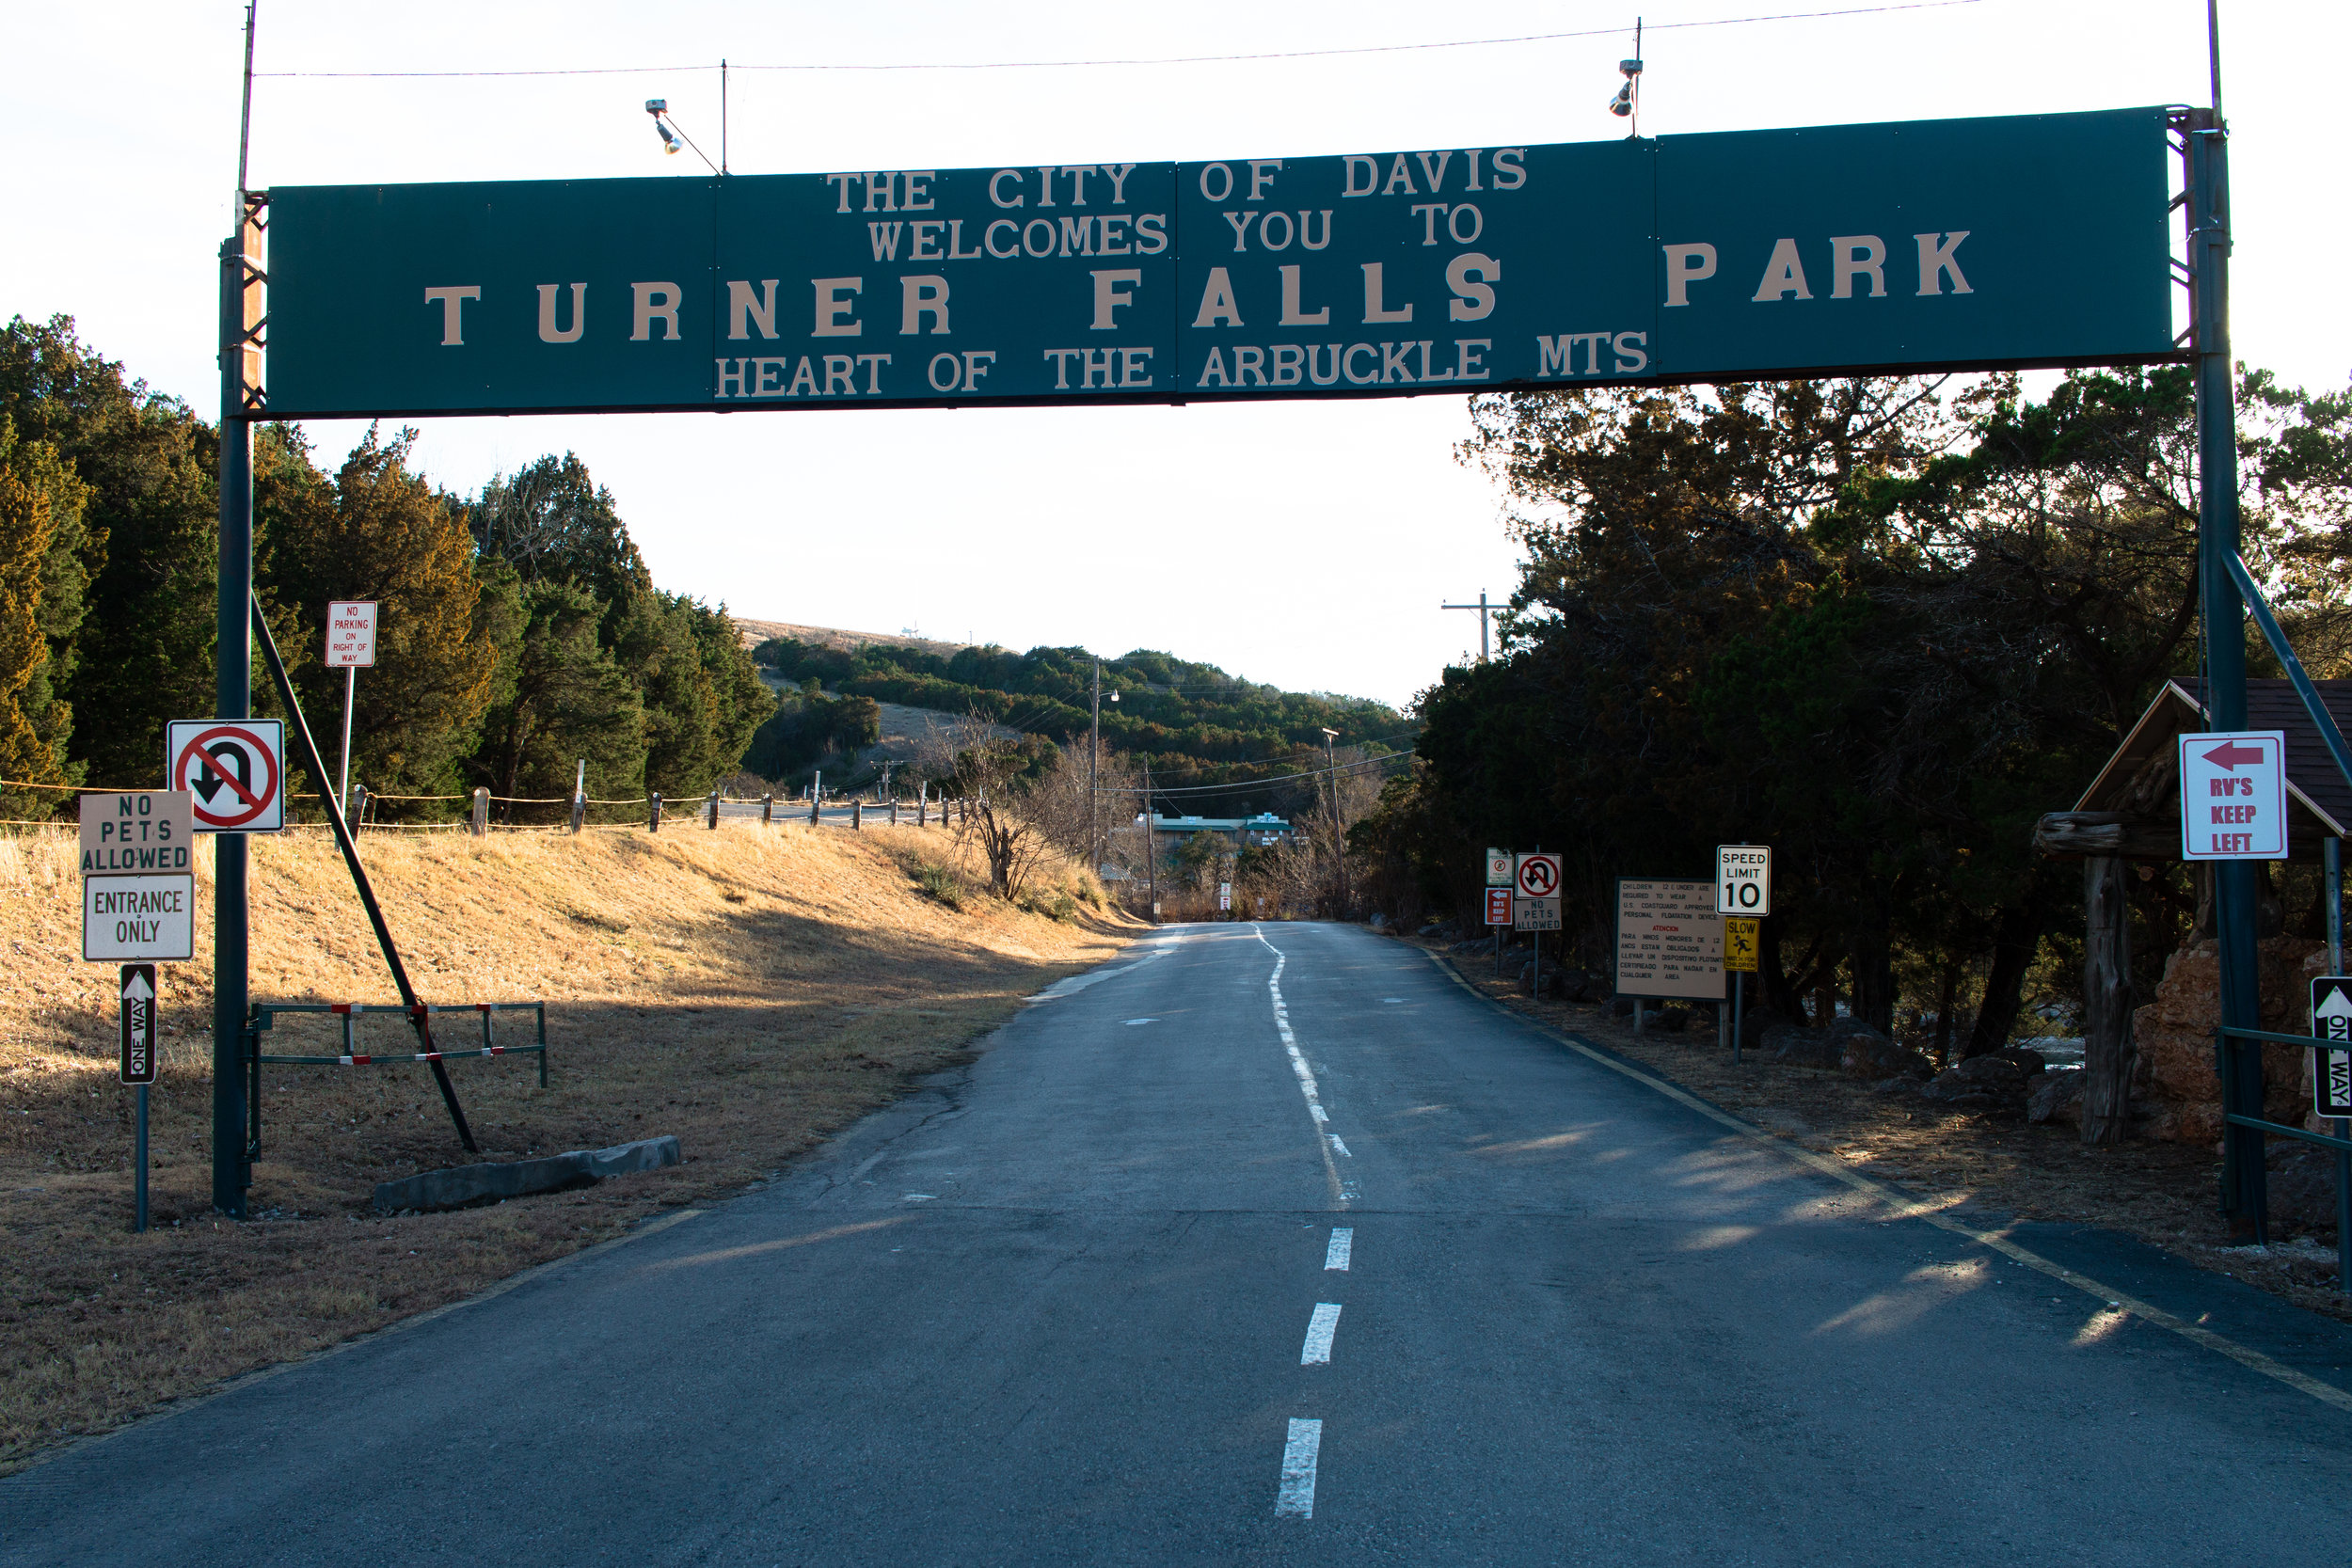 turner-falls-park-entrance-waterfall